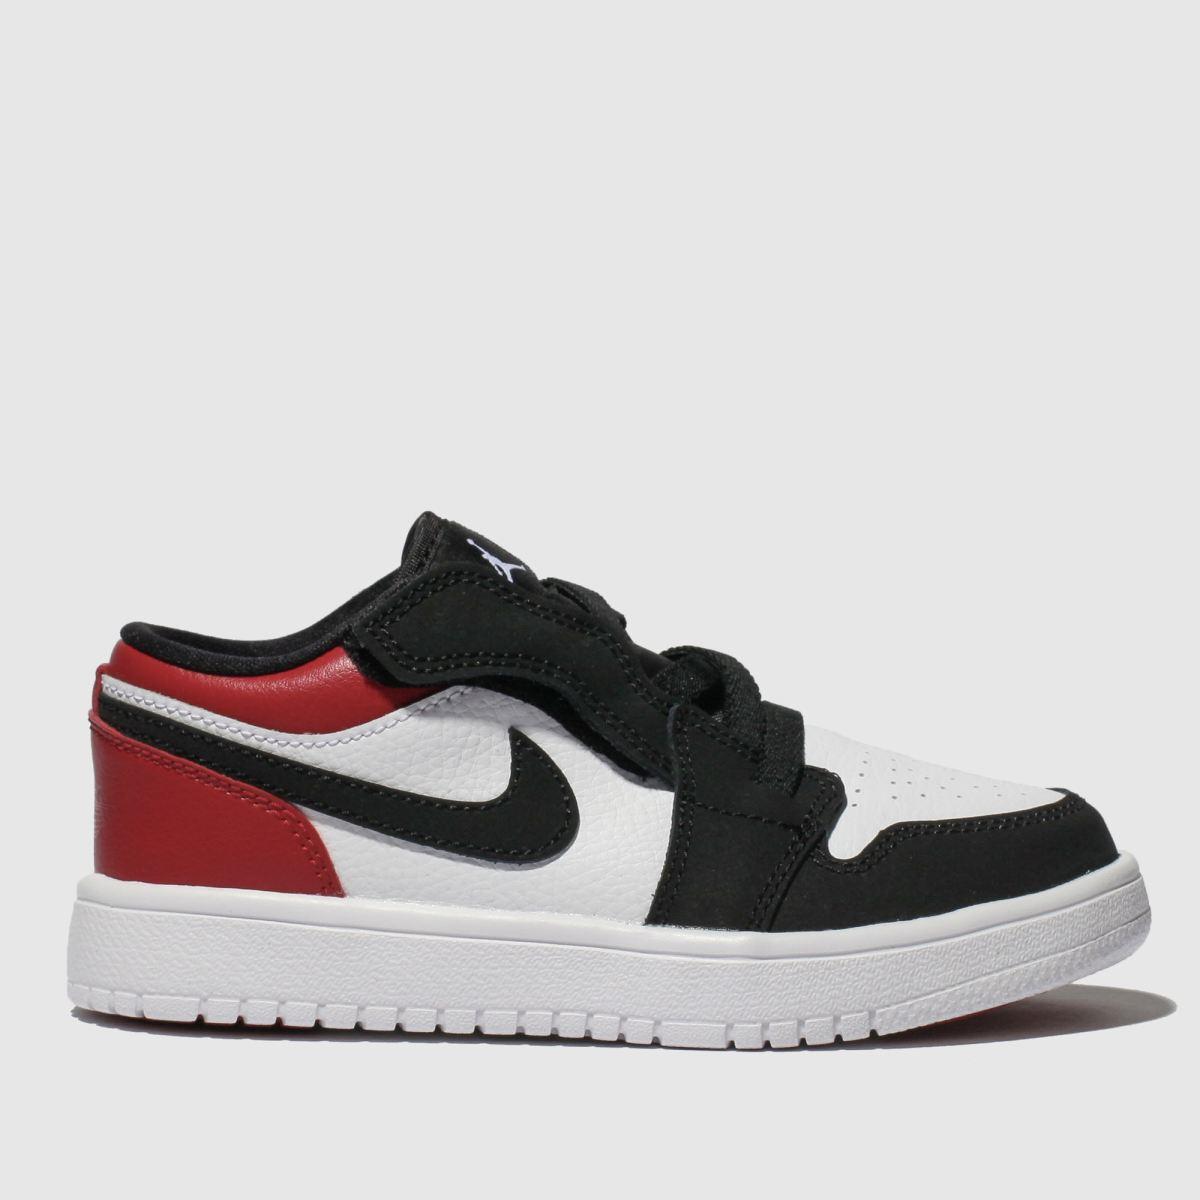 newest abdce 9f1cb Nike Jordan White   Red Jordan 1 Low Trainers Junior. Schuh